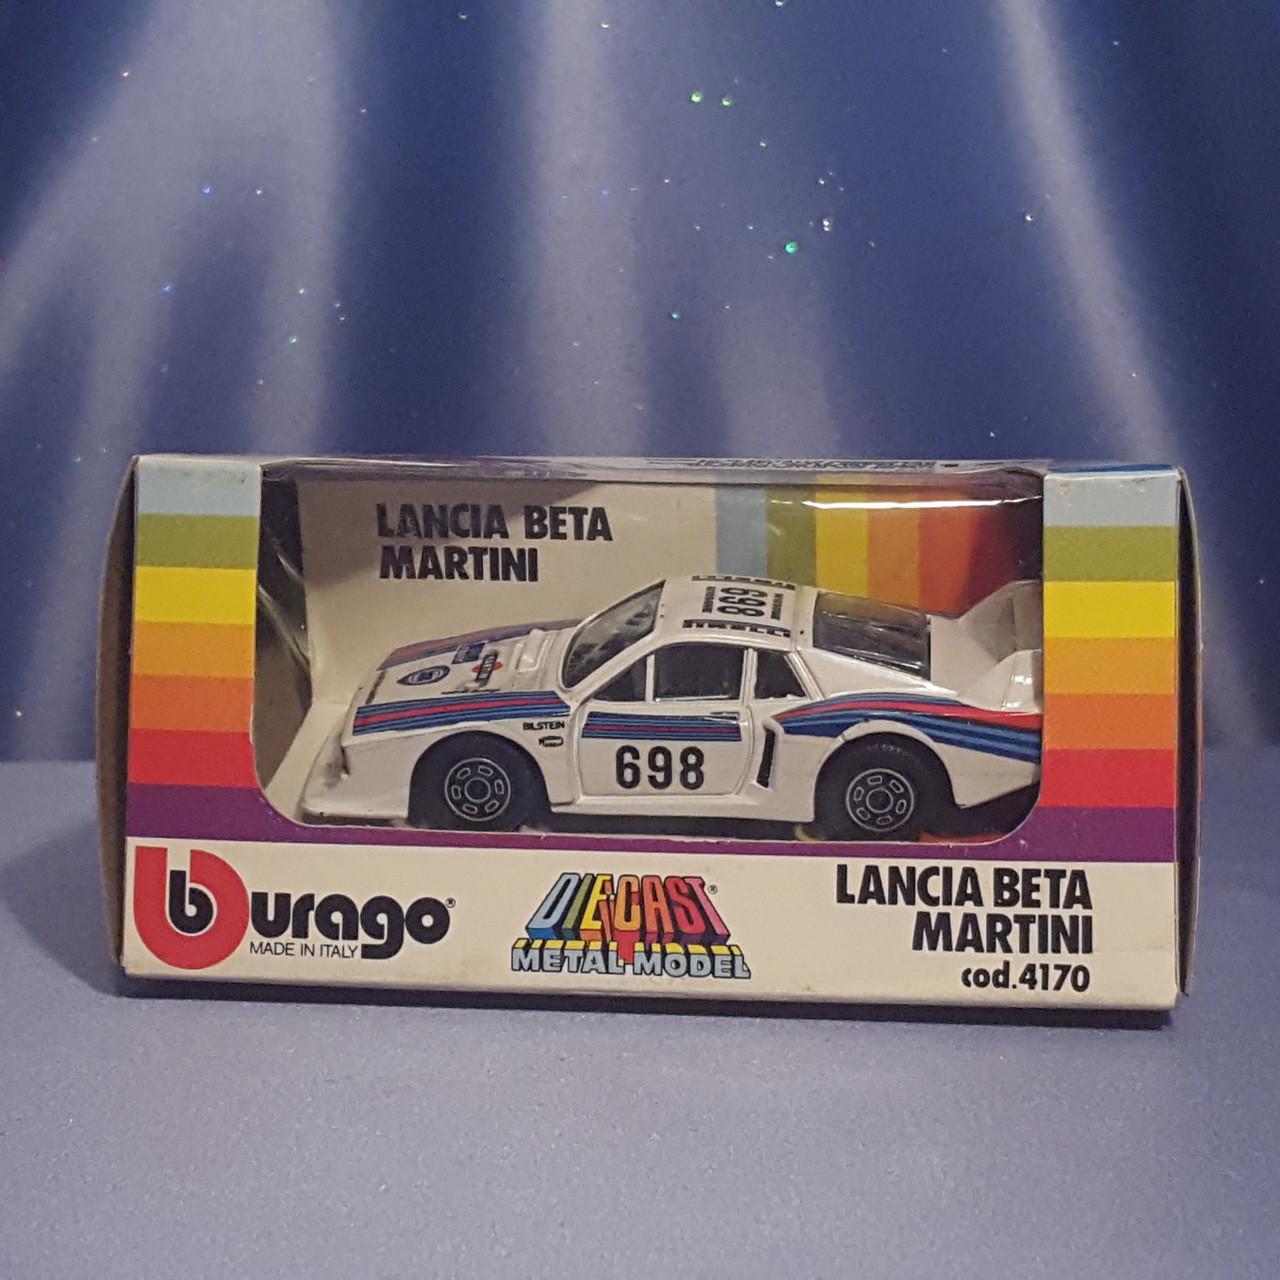 Lancia Beta Martini 1:43 Scale Car by Bburago.